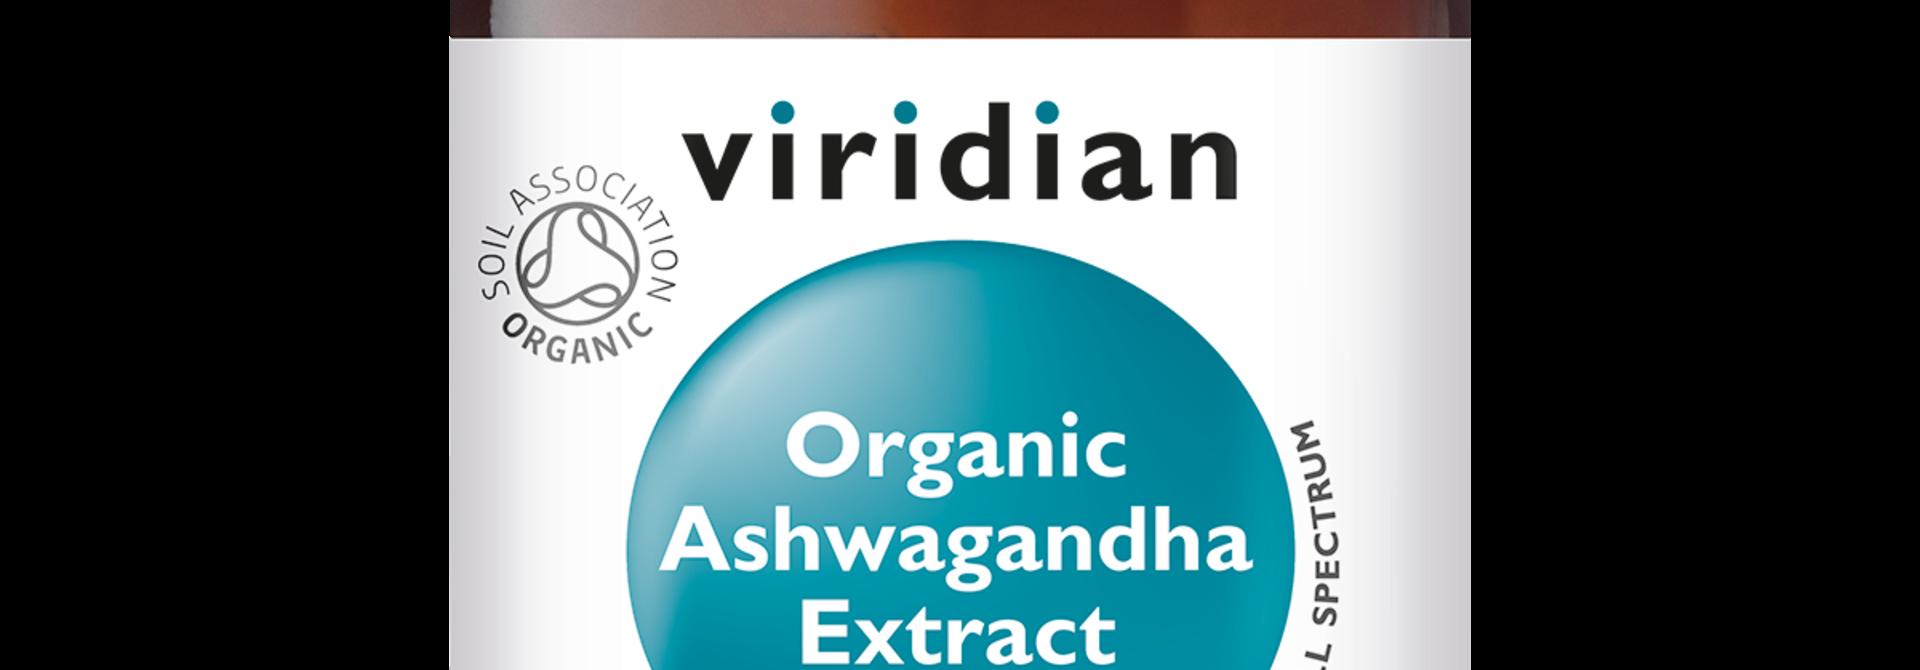 Organic Ashwagandha Extract 60 plantaardige capsules